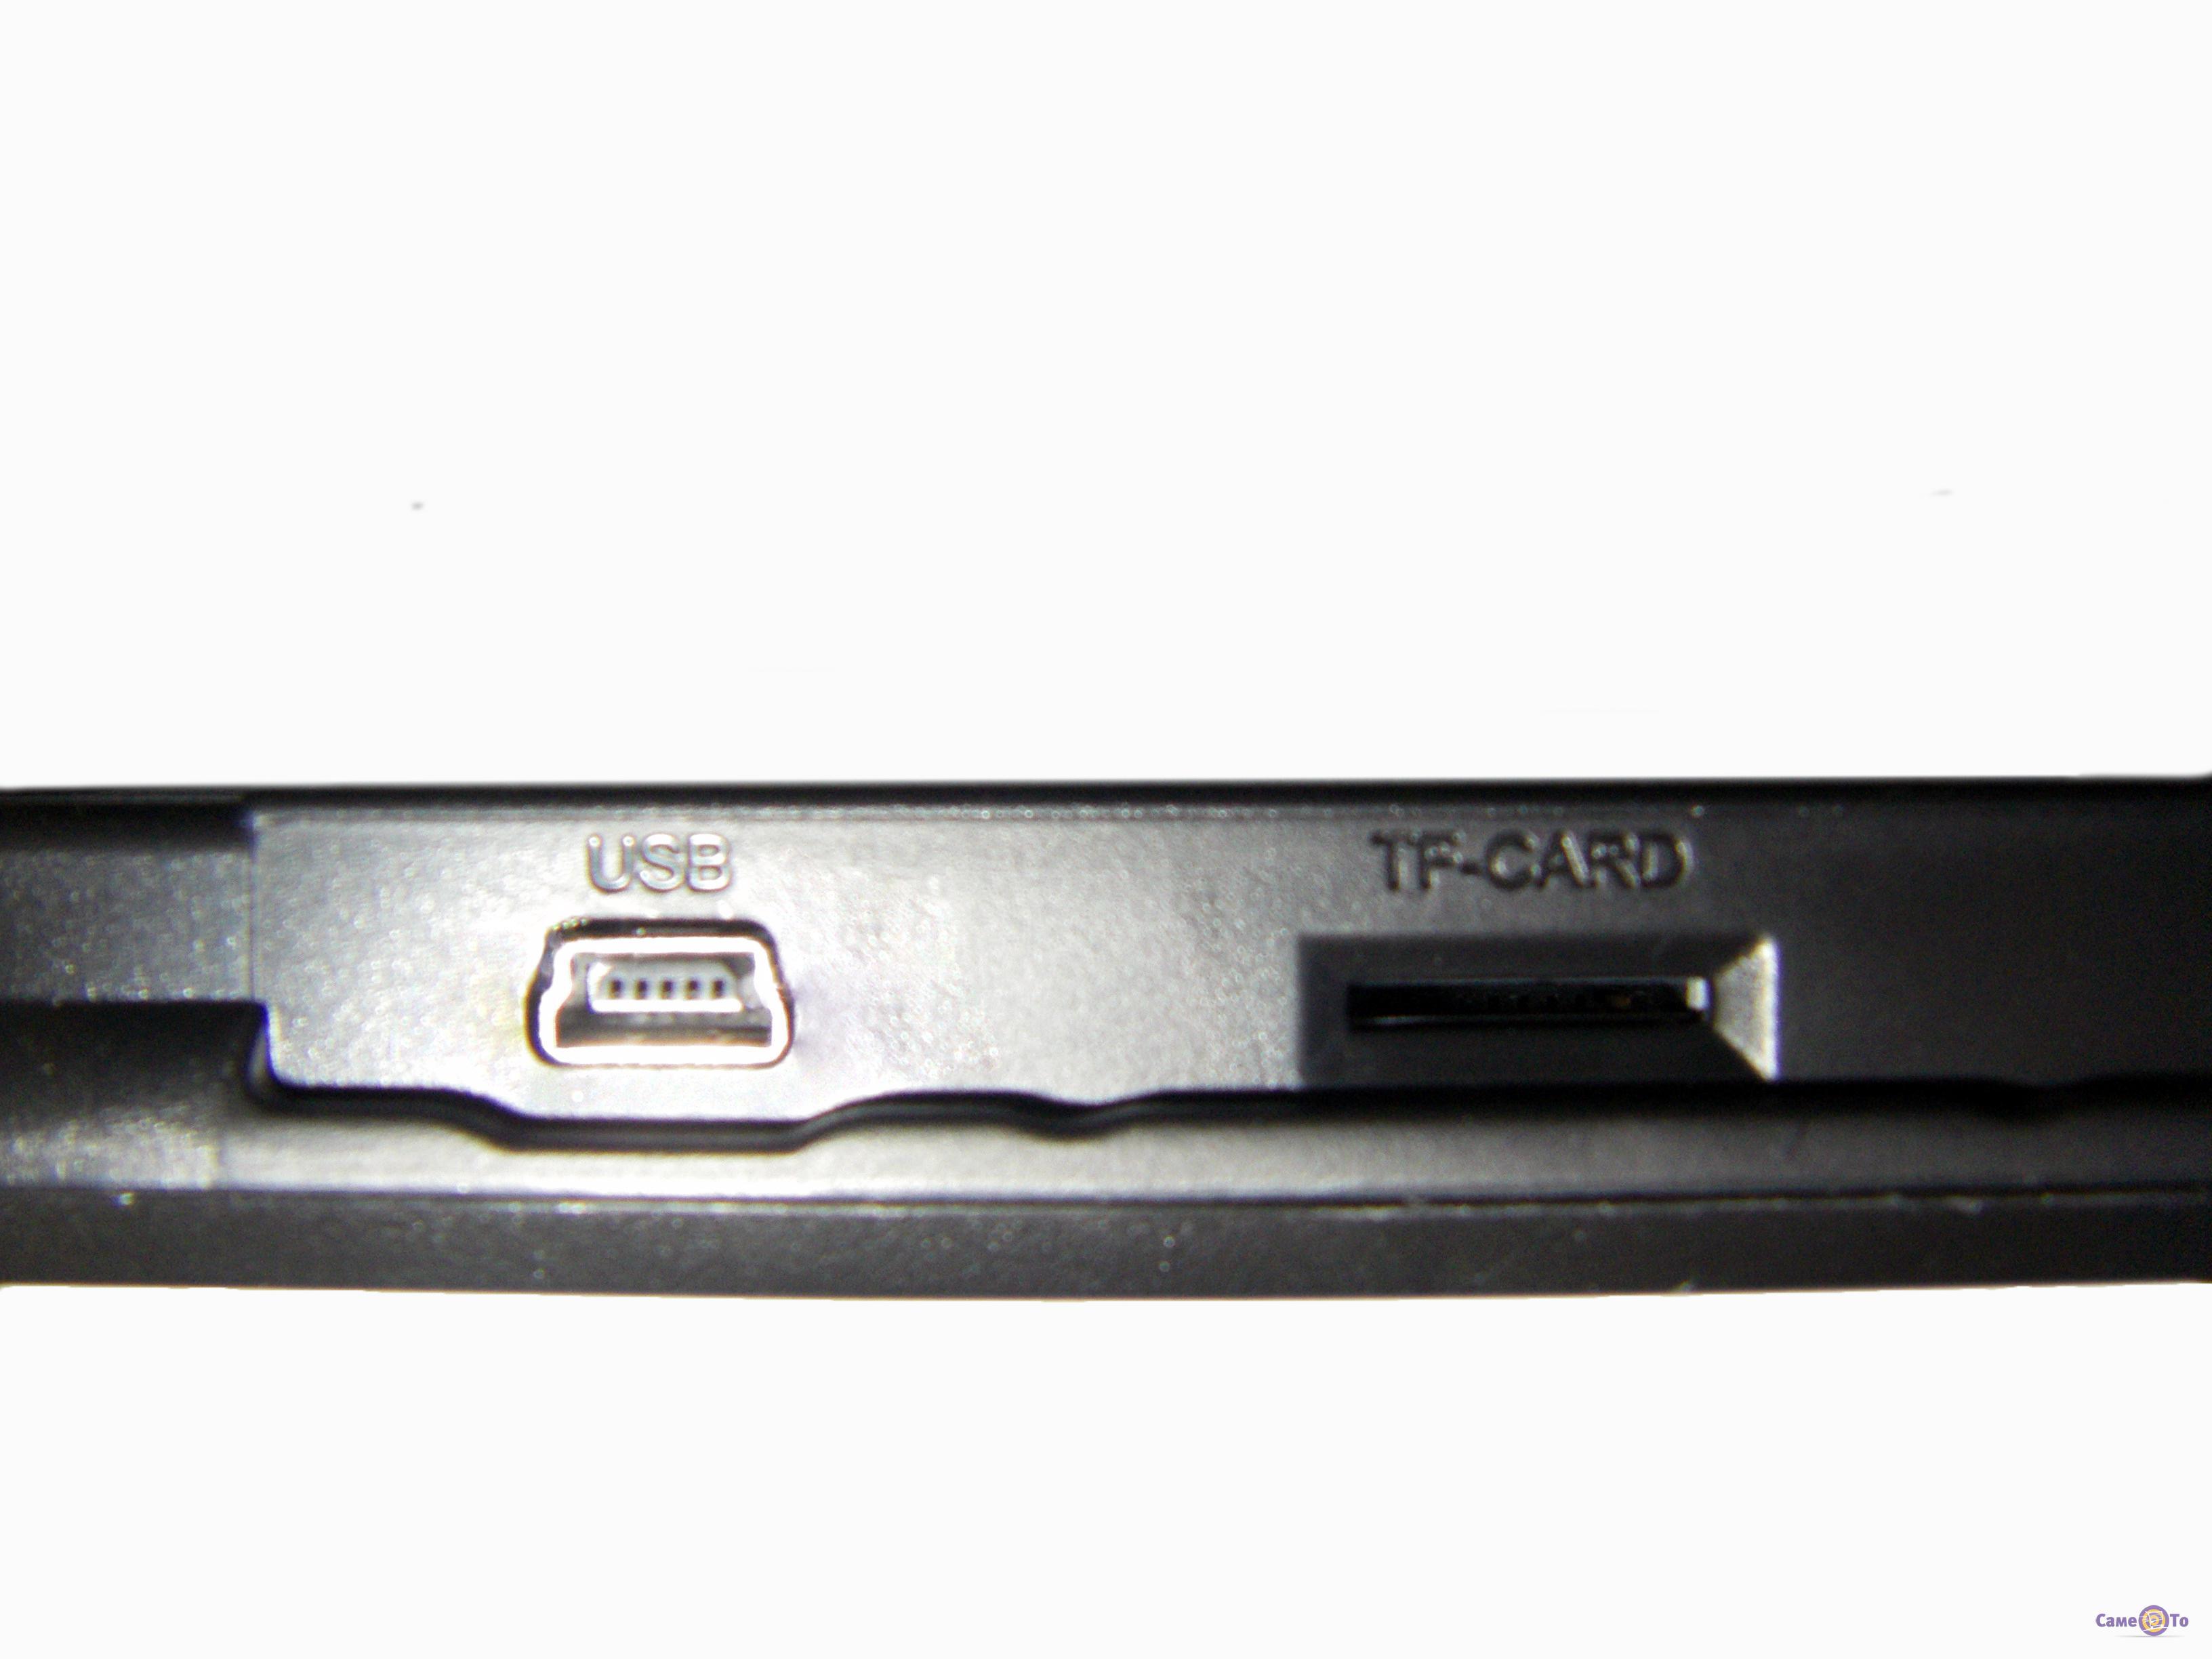 Зеркало заднего вида со встроенным видеорегистратором Rear-View Mirror Vehicle traveling data recorder 1080P